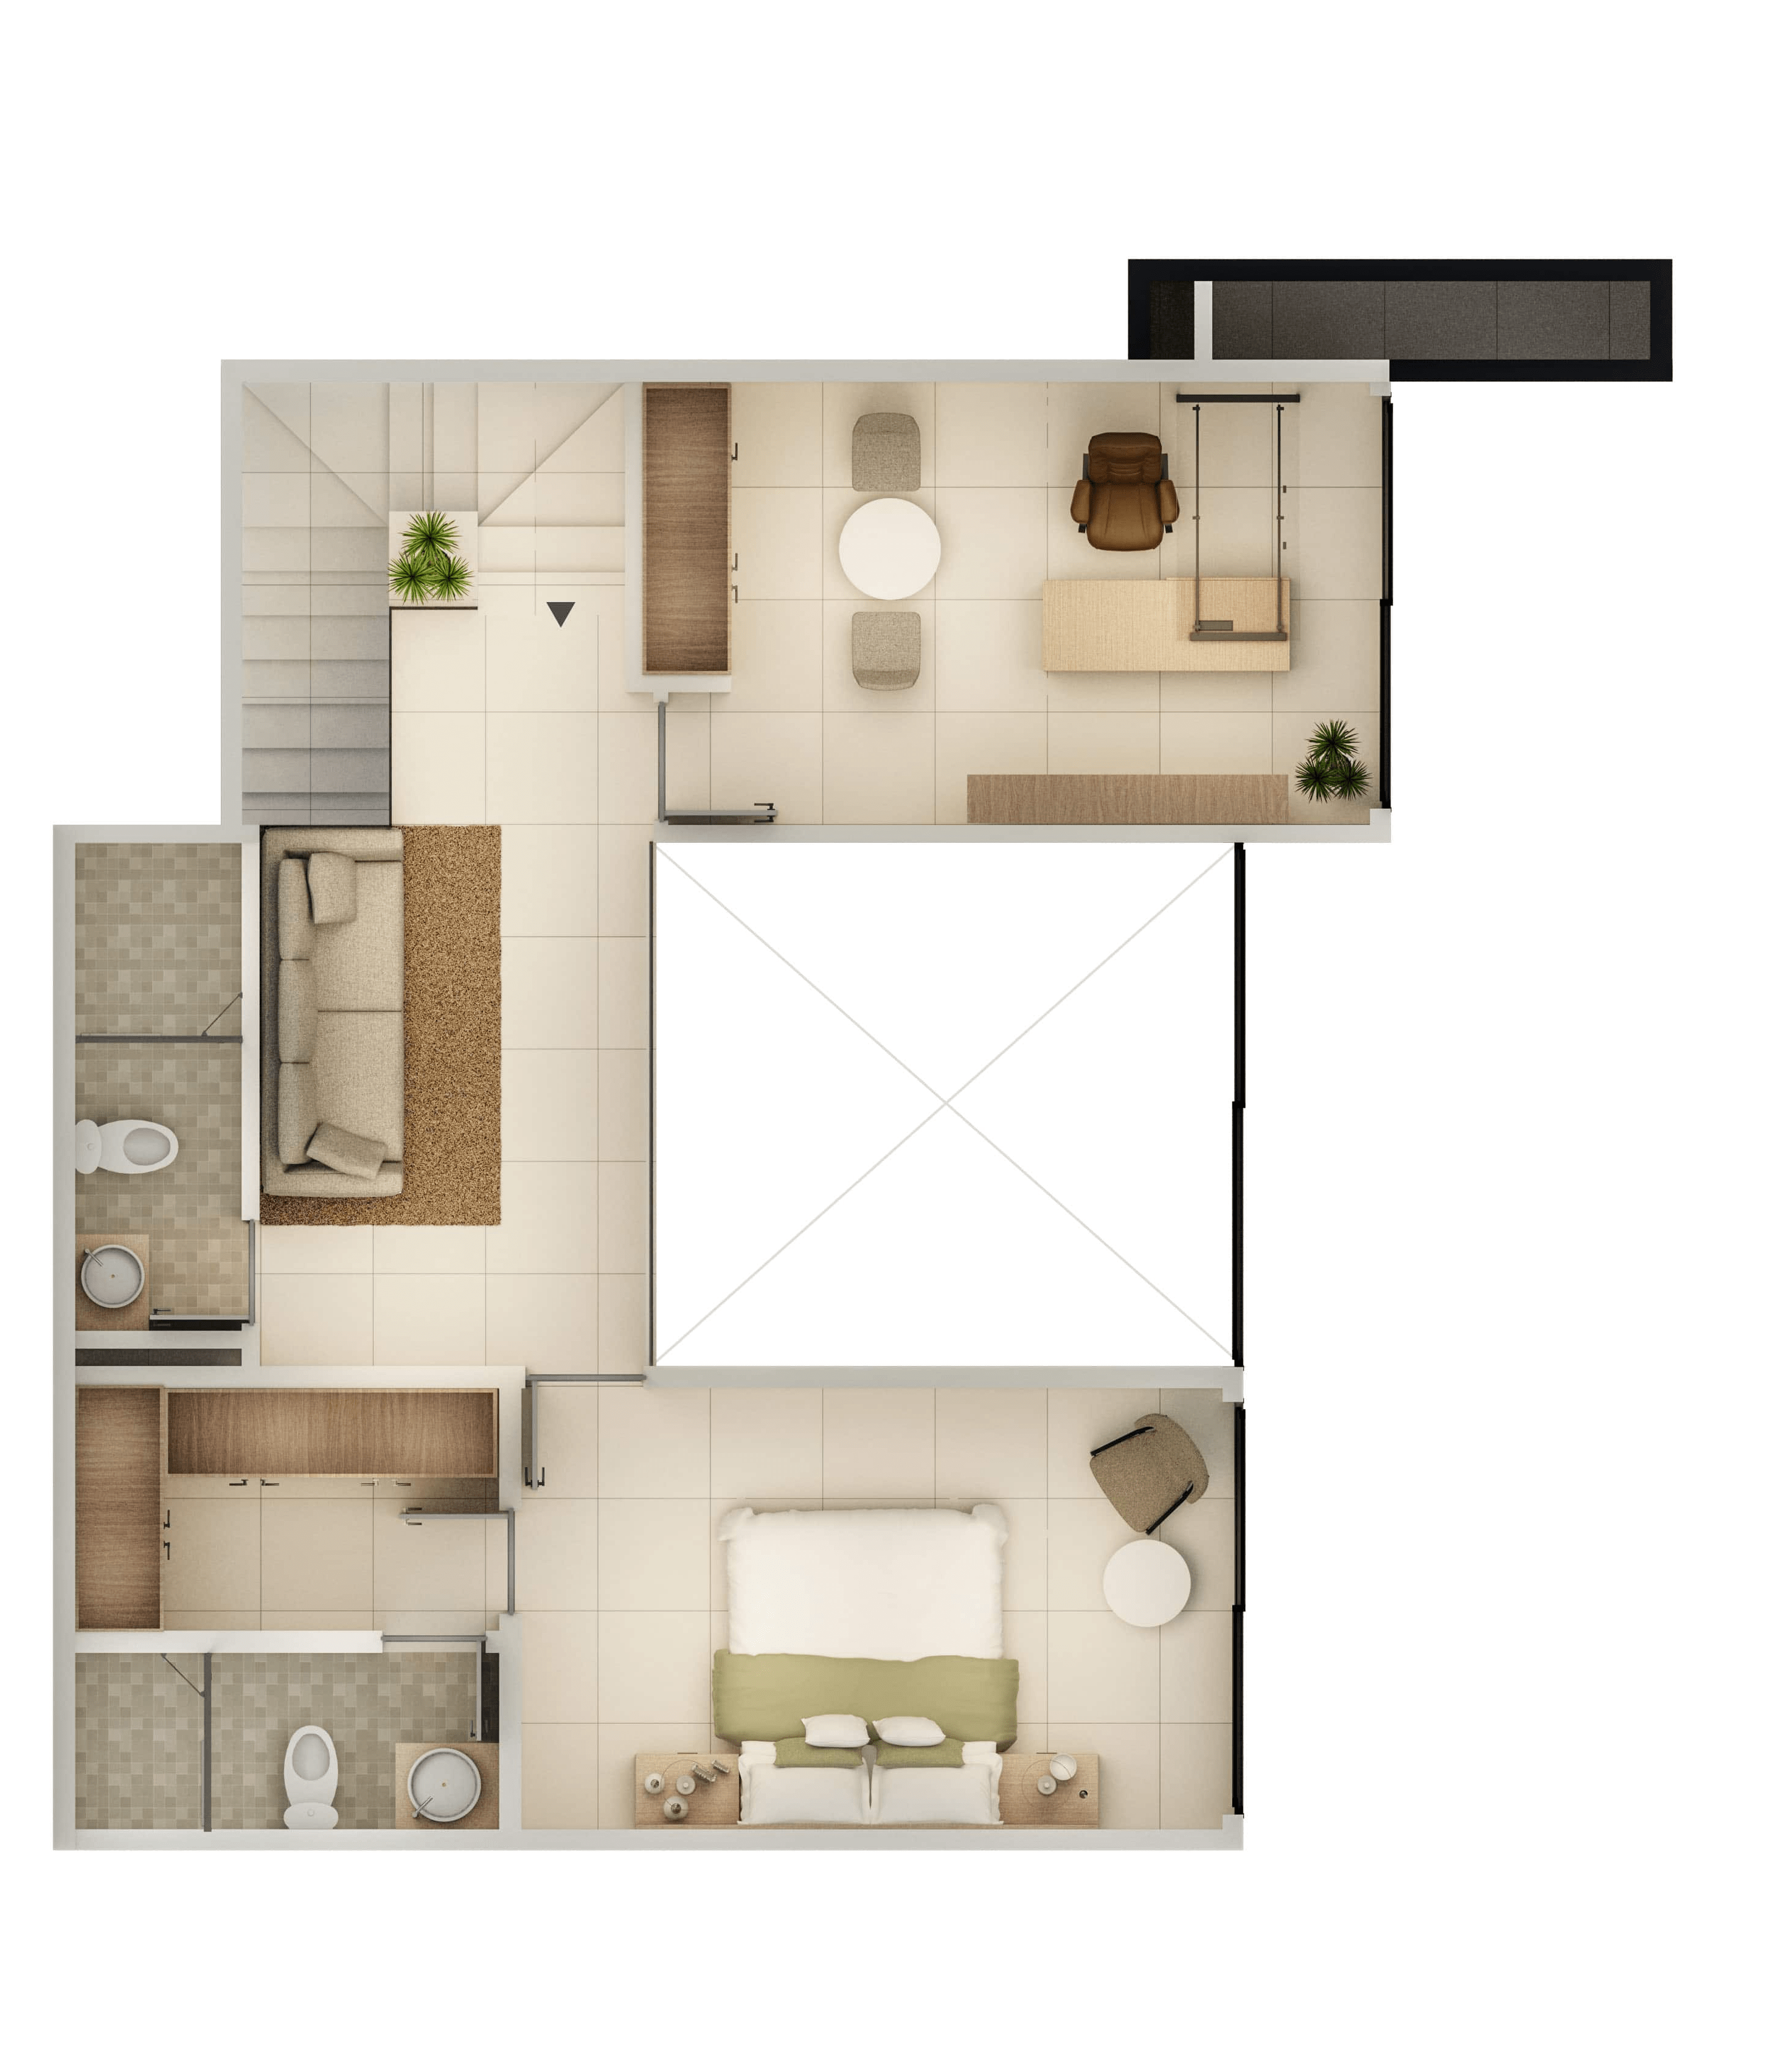 penthouse_4_alcobas_planta_1-min